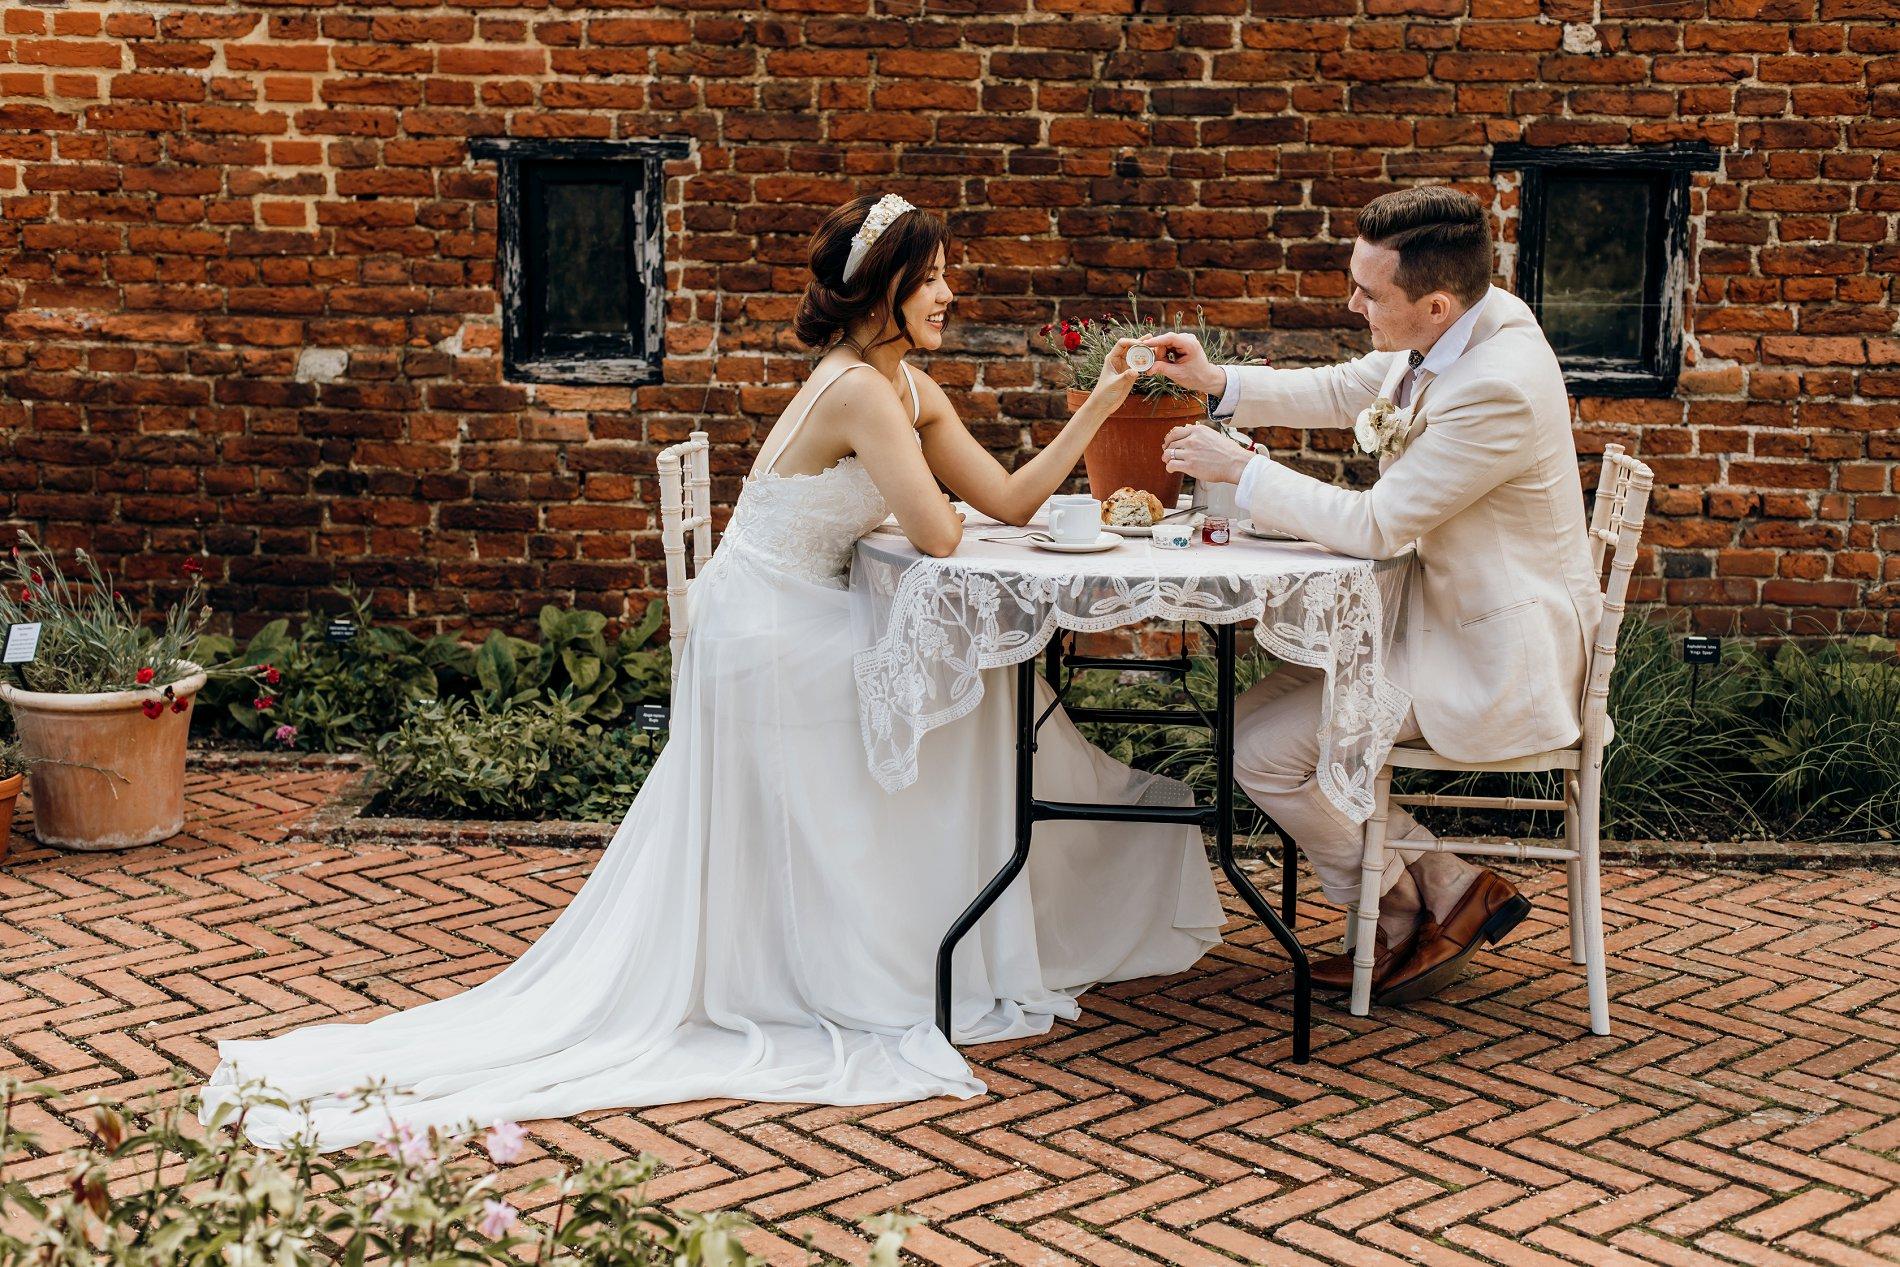 A Golden Boho Wedding Shoot at Cressing Temple Barns (c) Kate Boston Photography (33)